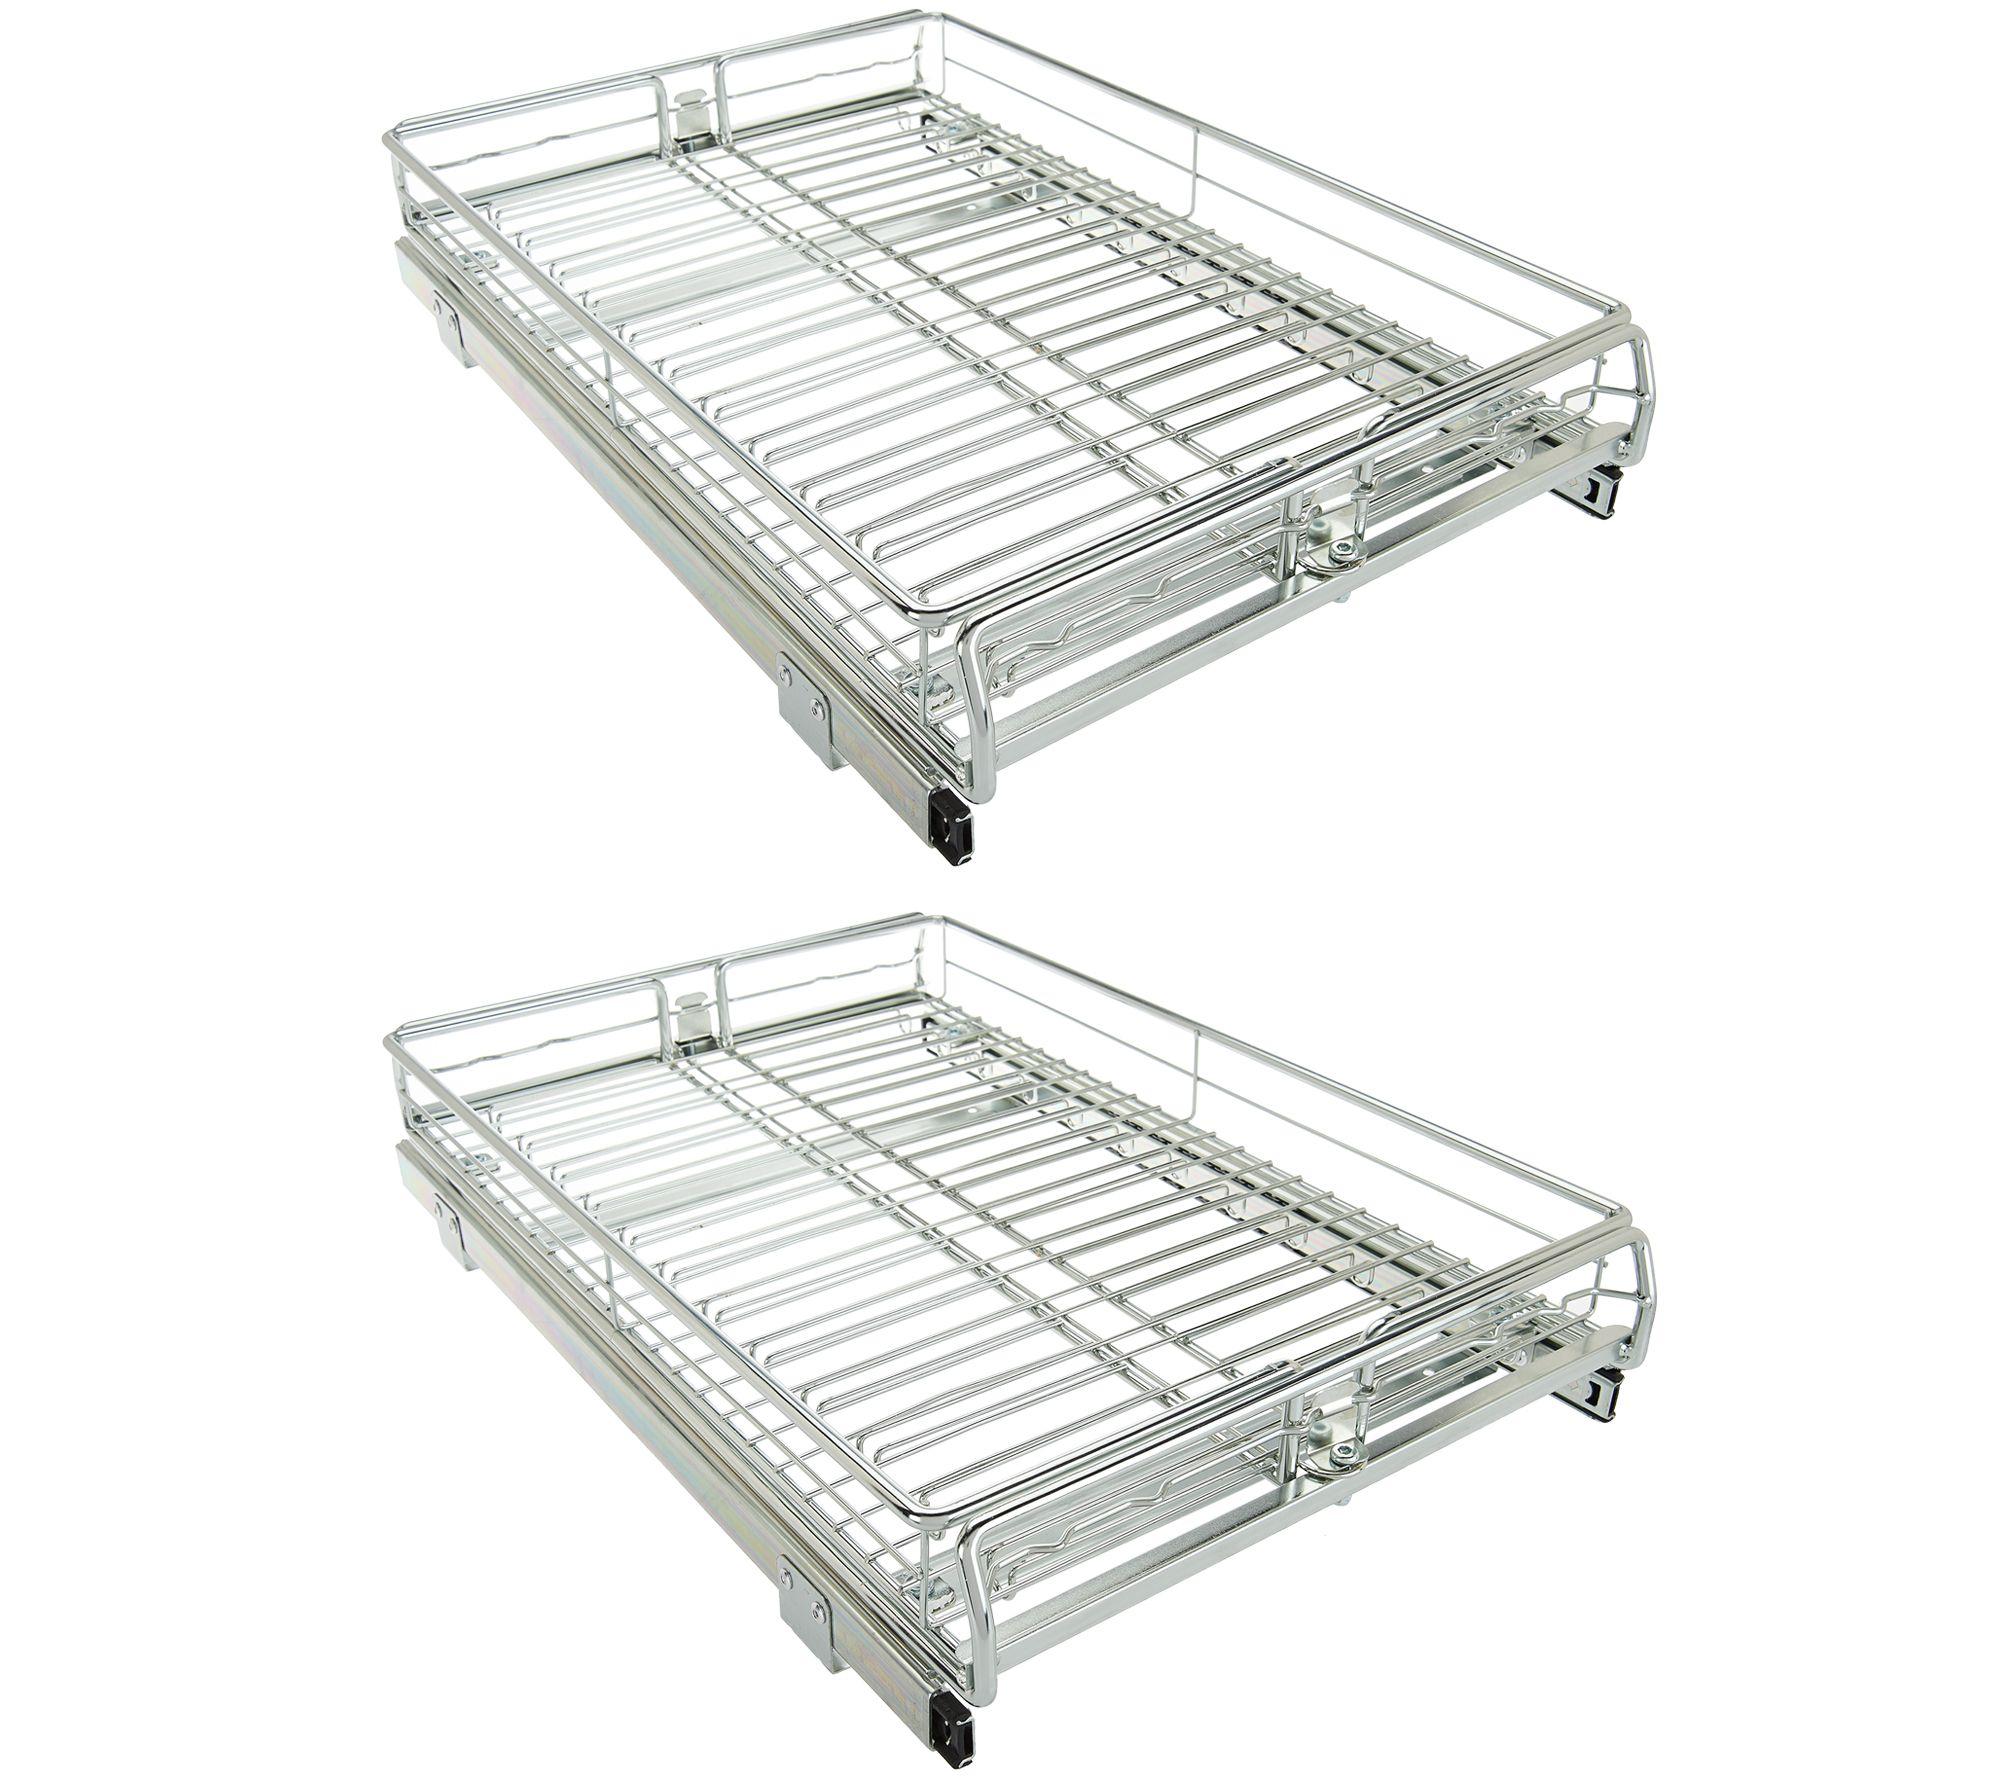 Pop-It Set of 2 Adjustable Sliding Cabinet Organizers - Page 1 ...